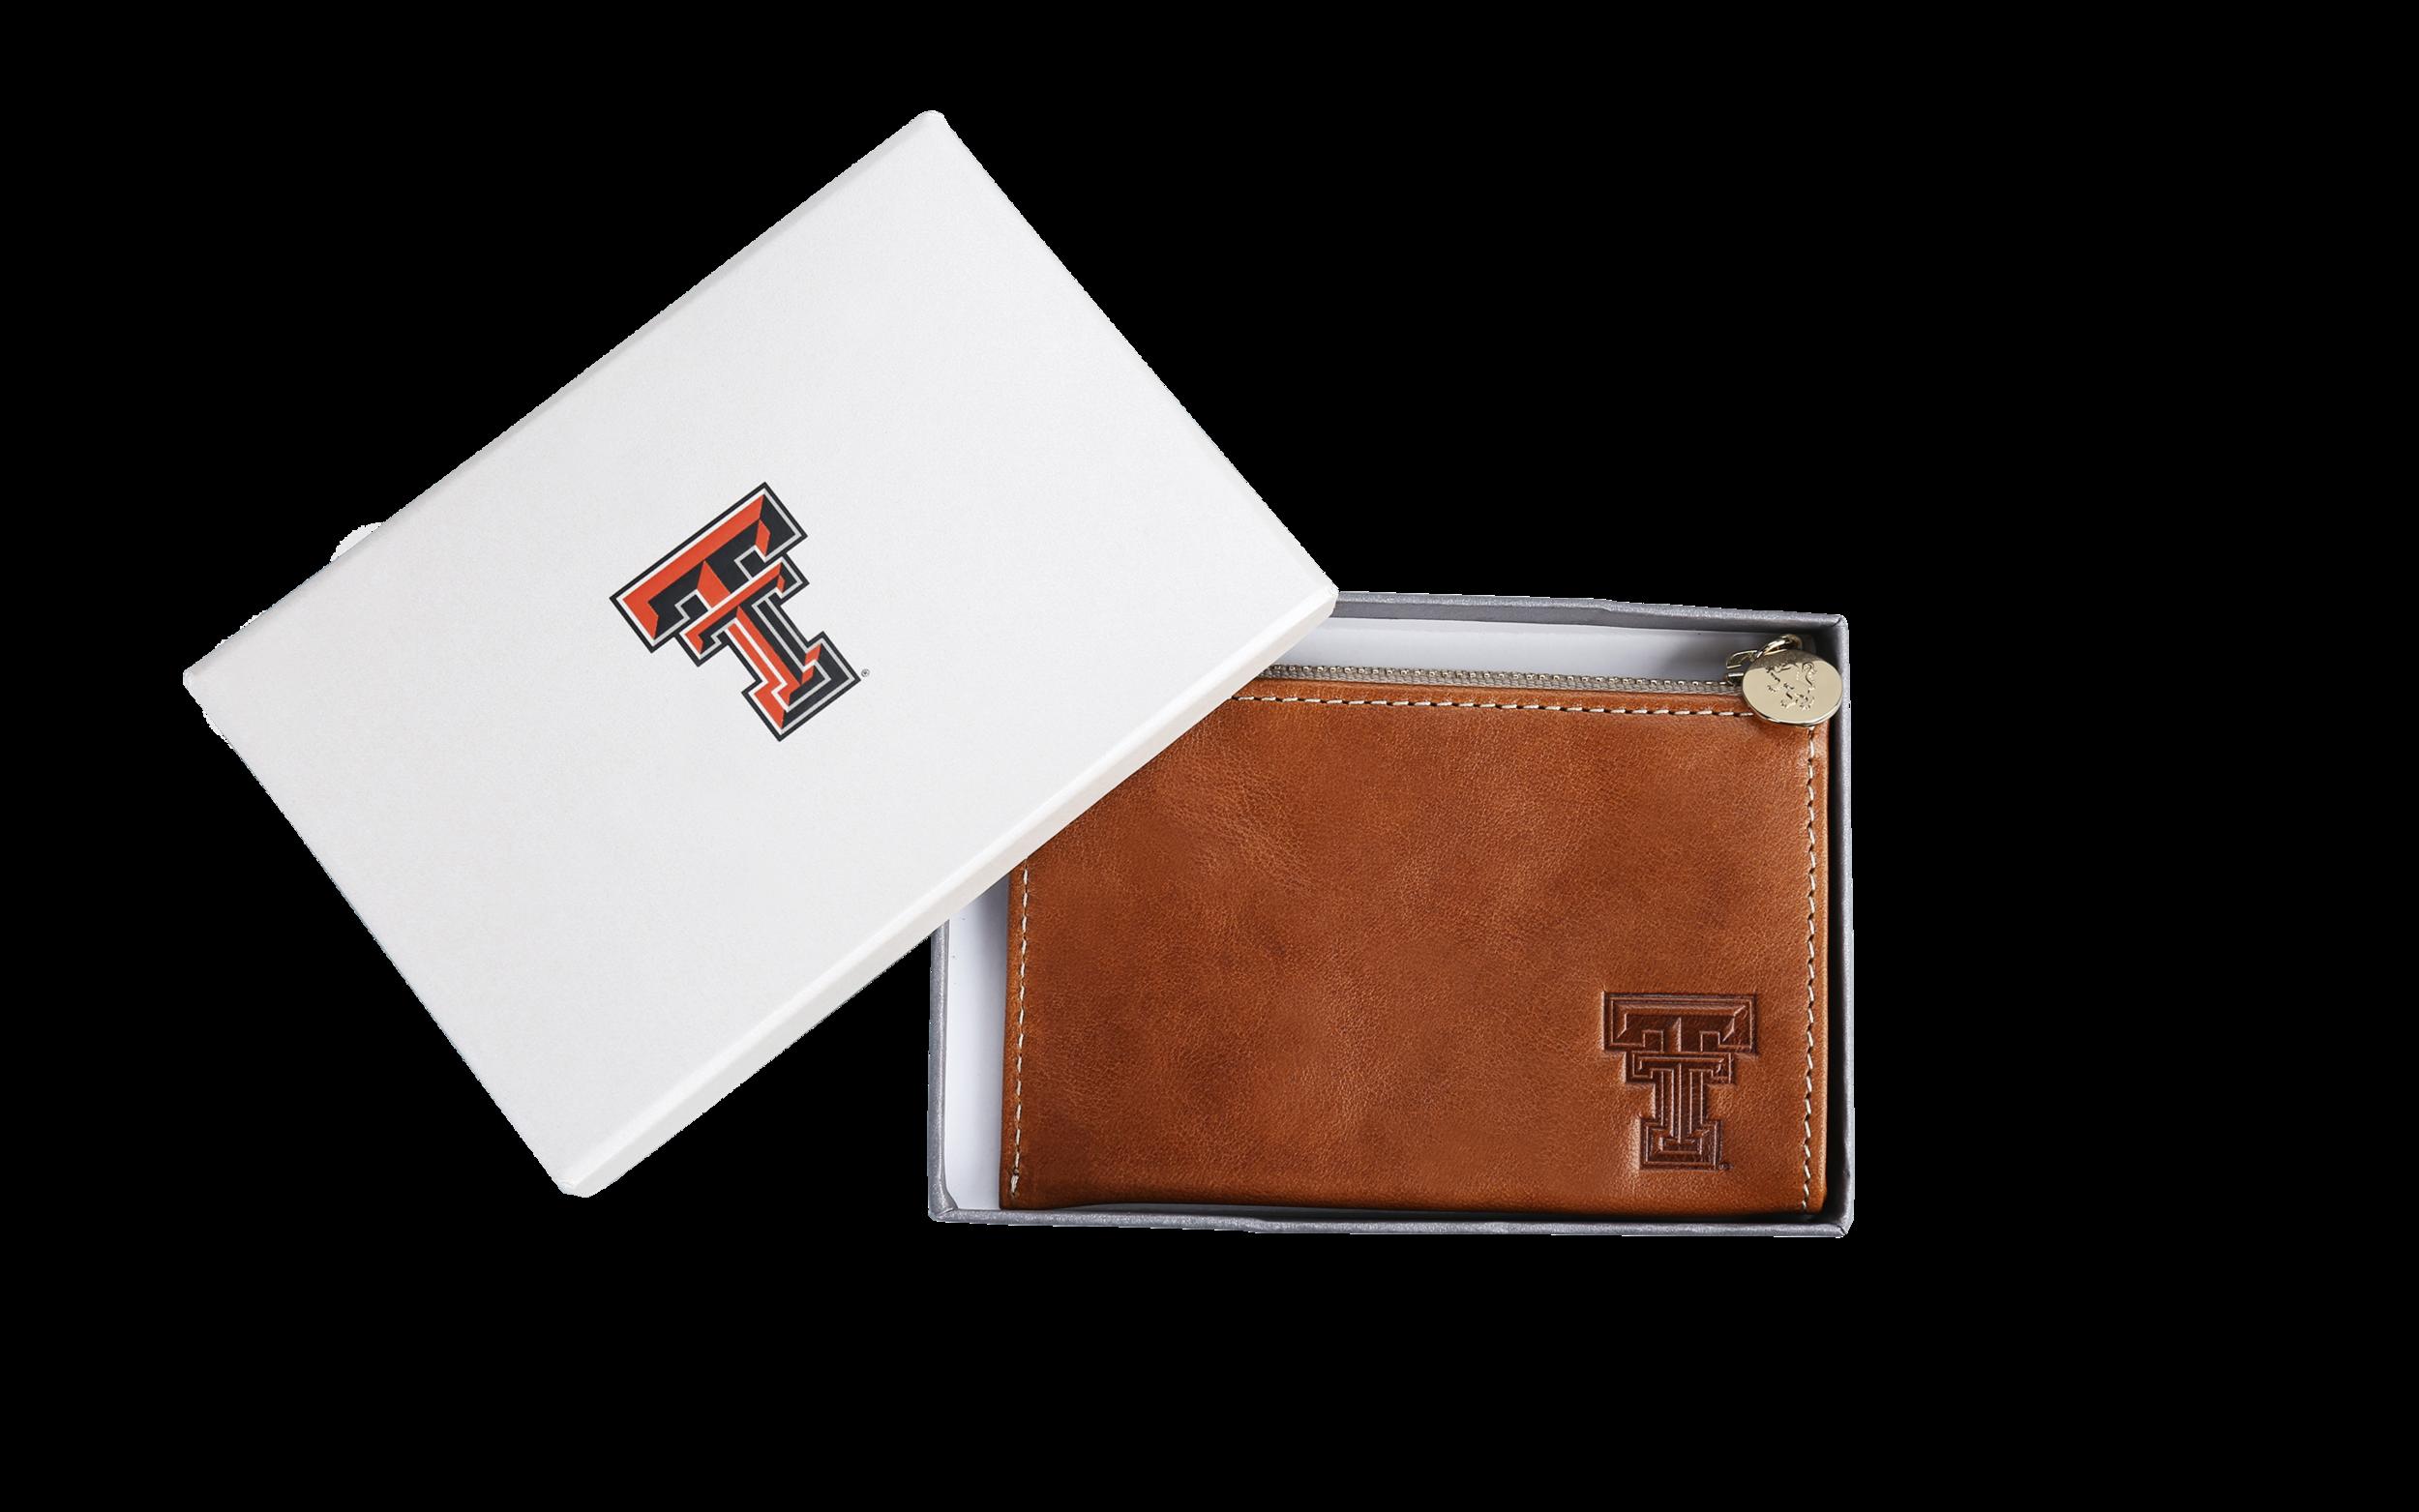 tx tech ladies wallet in box.png